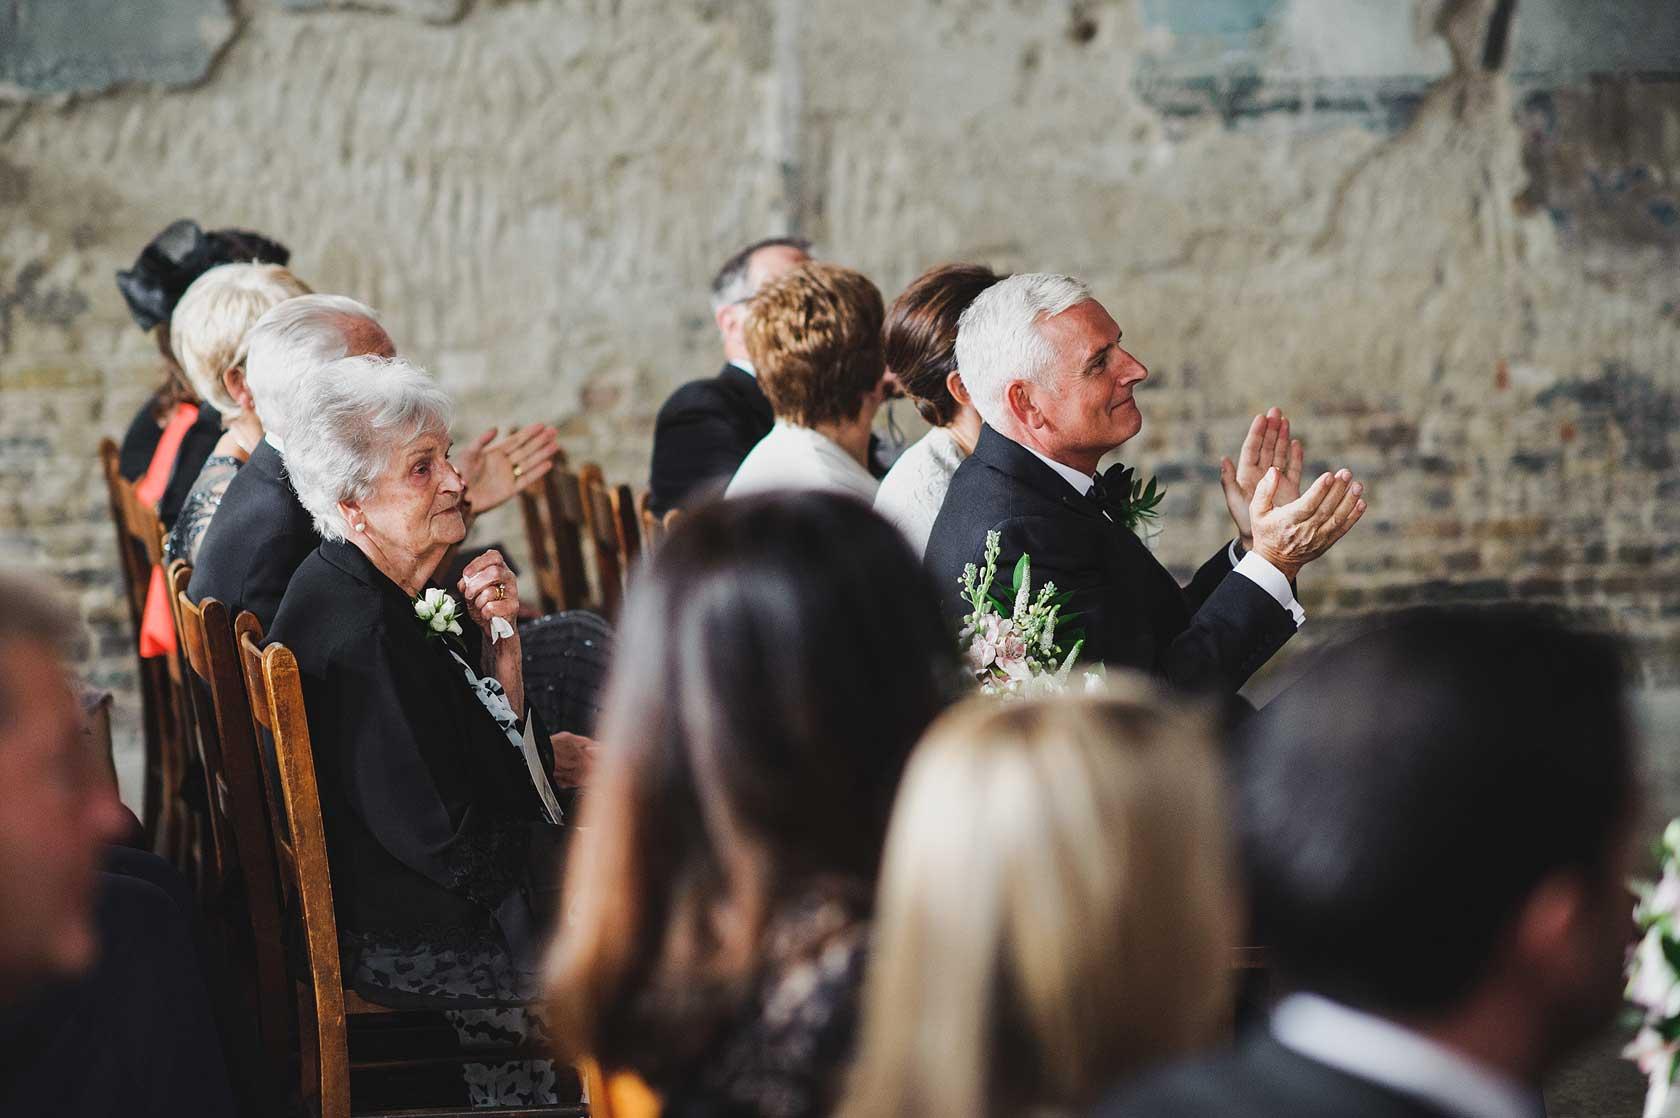 Reportage Wedding Photography at Asylum